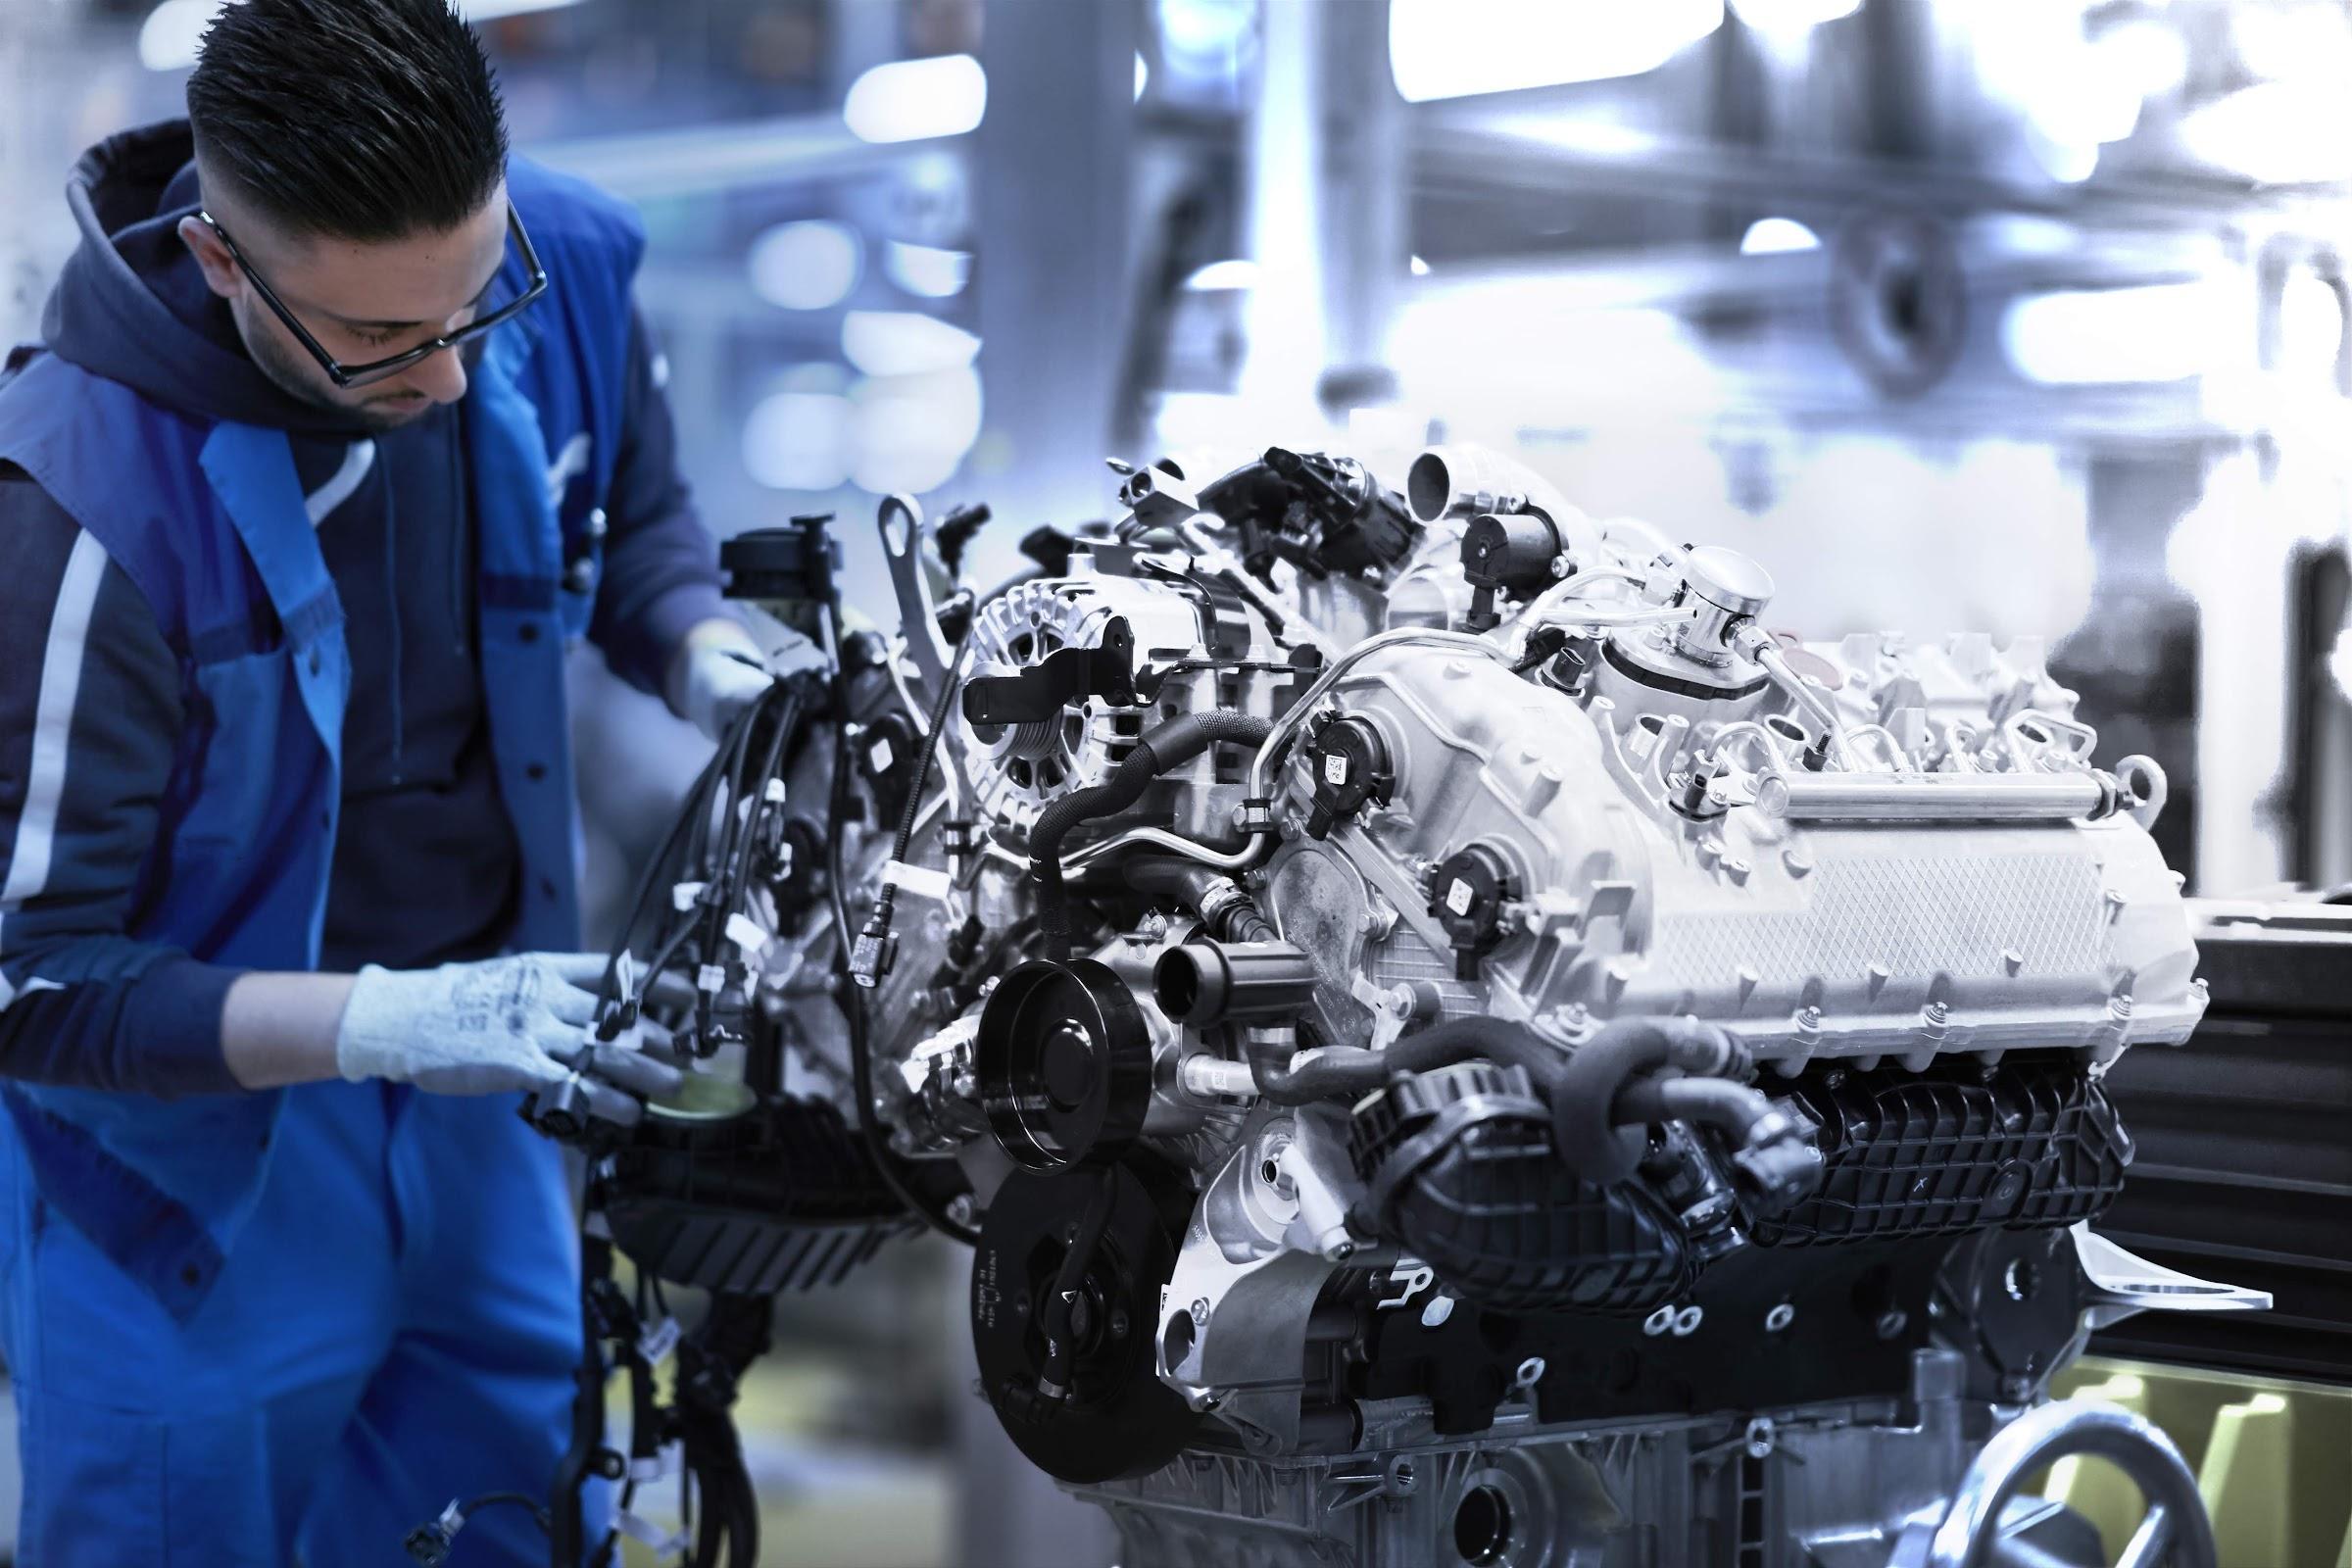 1DZFln9pBeMGBi27hpk2xWpaPgajoo55mRtif0gd2cOc6aSa04kZYloA2Vaux3F7kcVwDL0jMsGiwgIVXFDg2EqIDMhquMUF2jSFl8aLGB PWS1uwTP4O8j7f ztltJ37GpL1nU3cw=w2400 - Así es el montaje del motor V8 del BMW Serie 8 Coupé